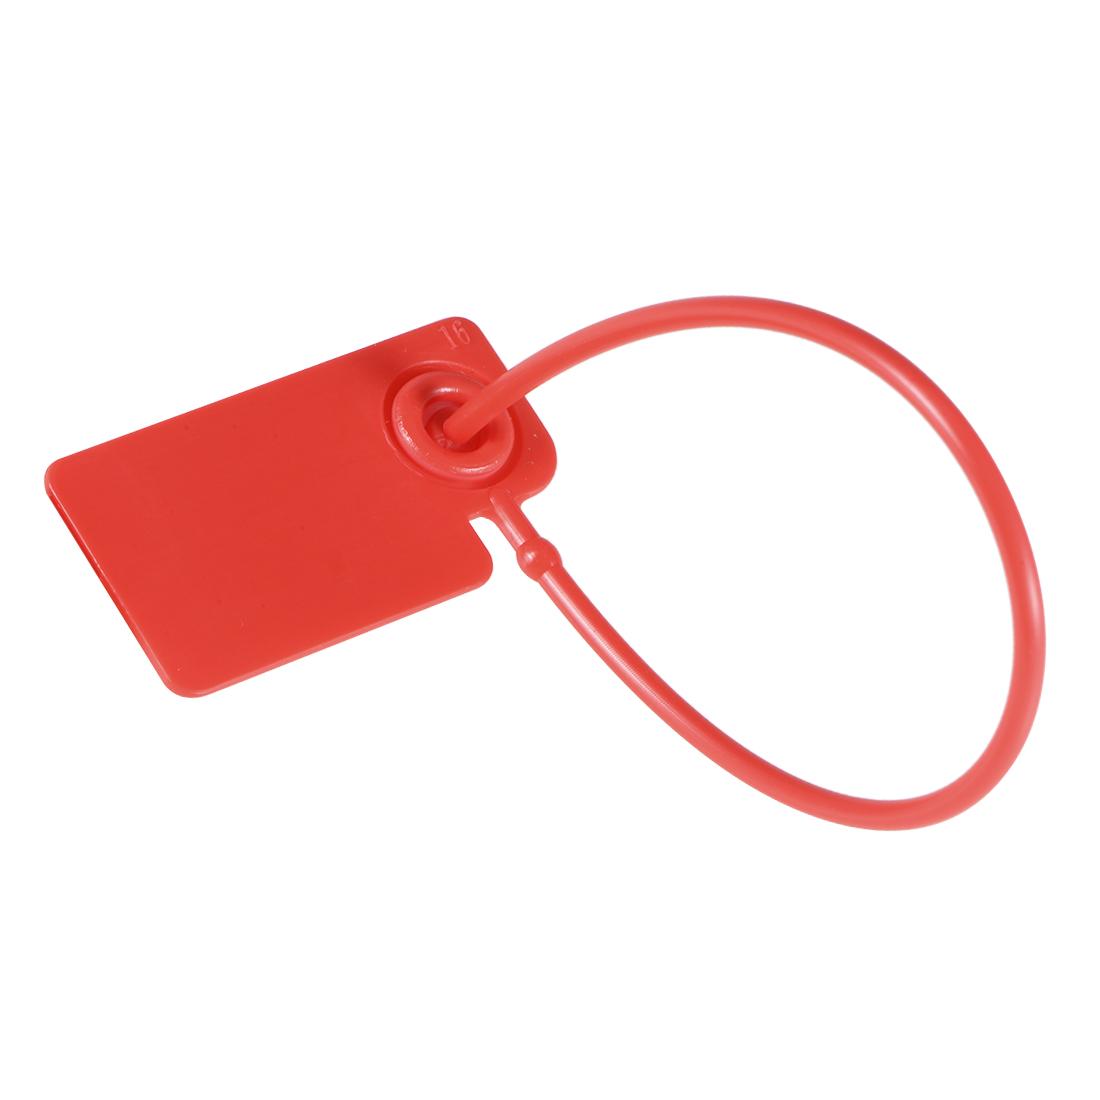 Plastic Zip Ties Security Tags Anti-Tamper 165mm Length,Red,Pack of 50